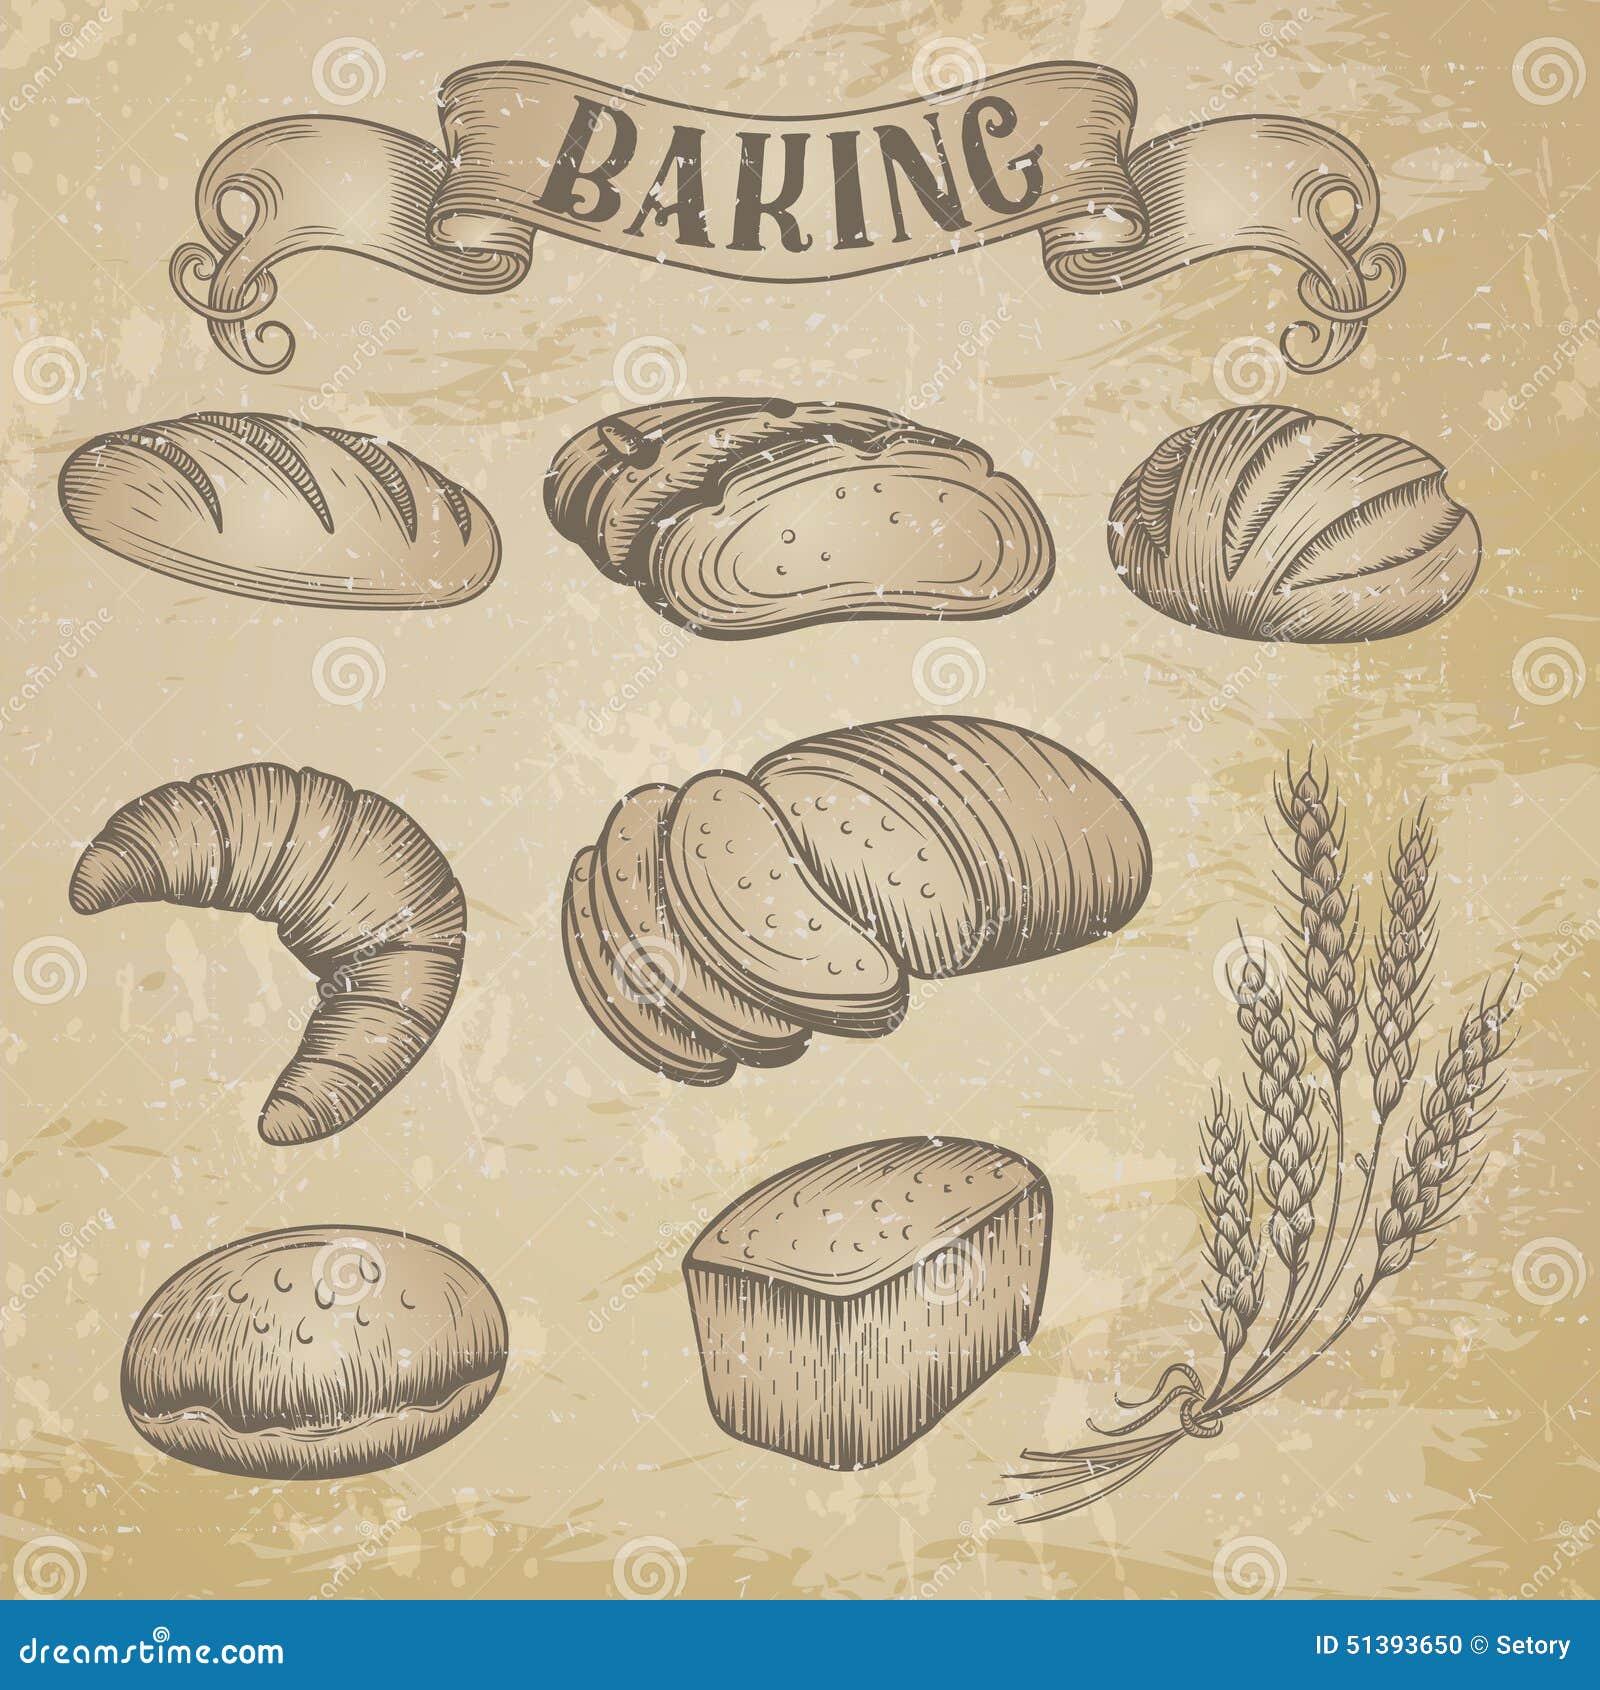 Hand drawn bakery icons set